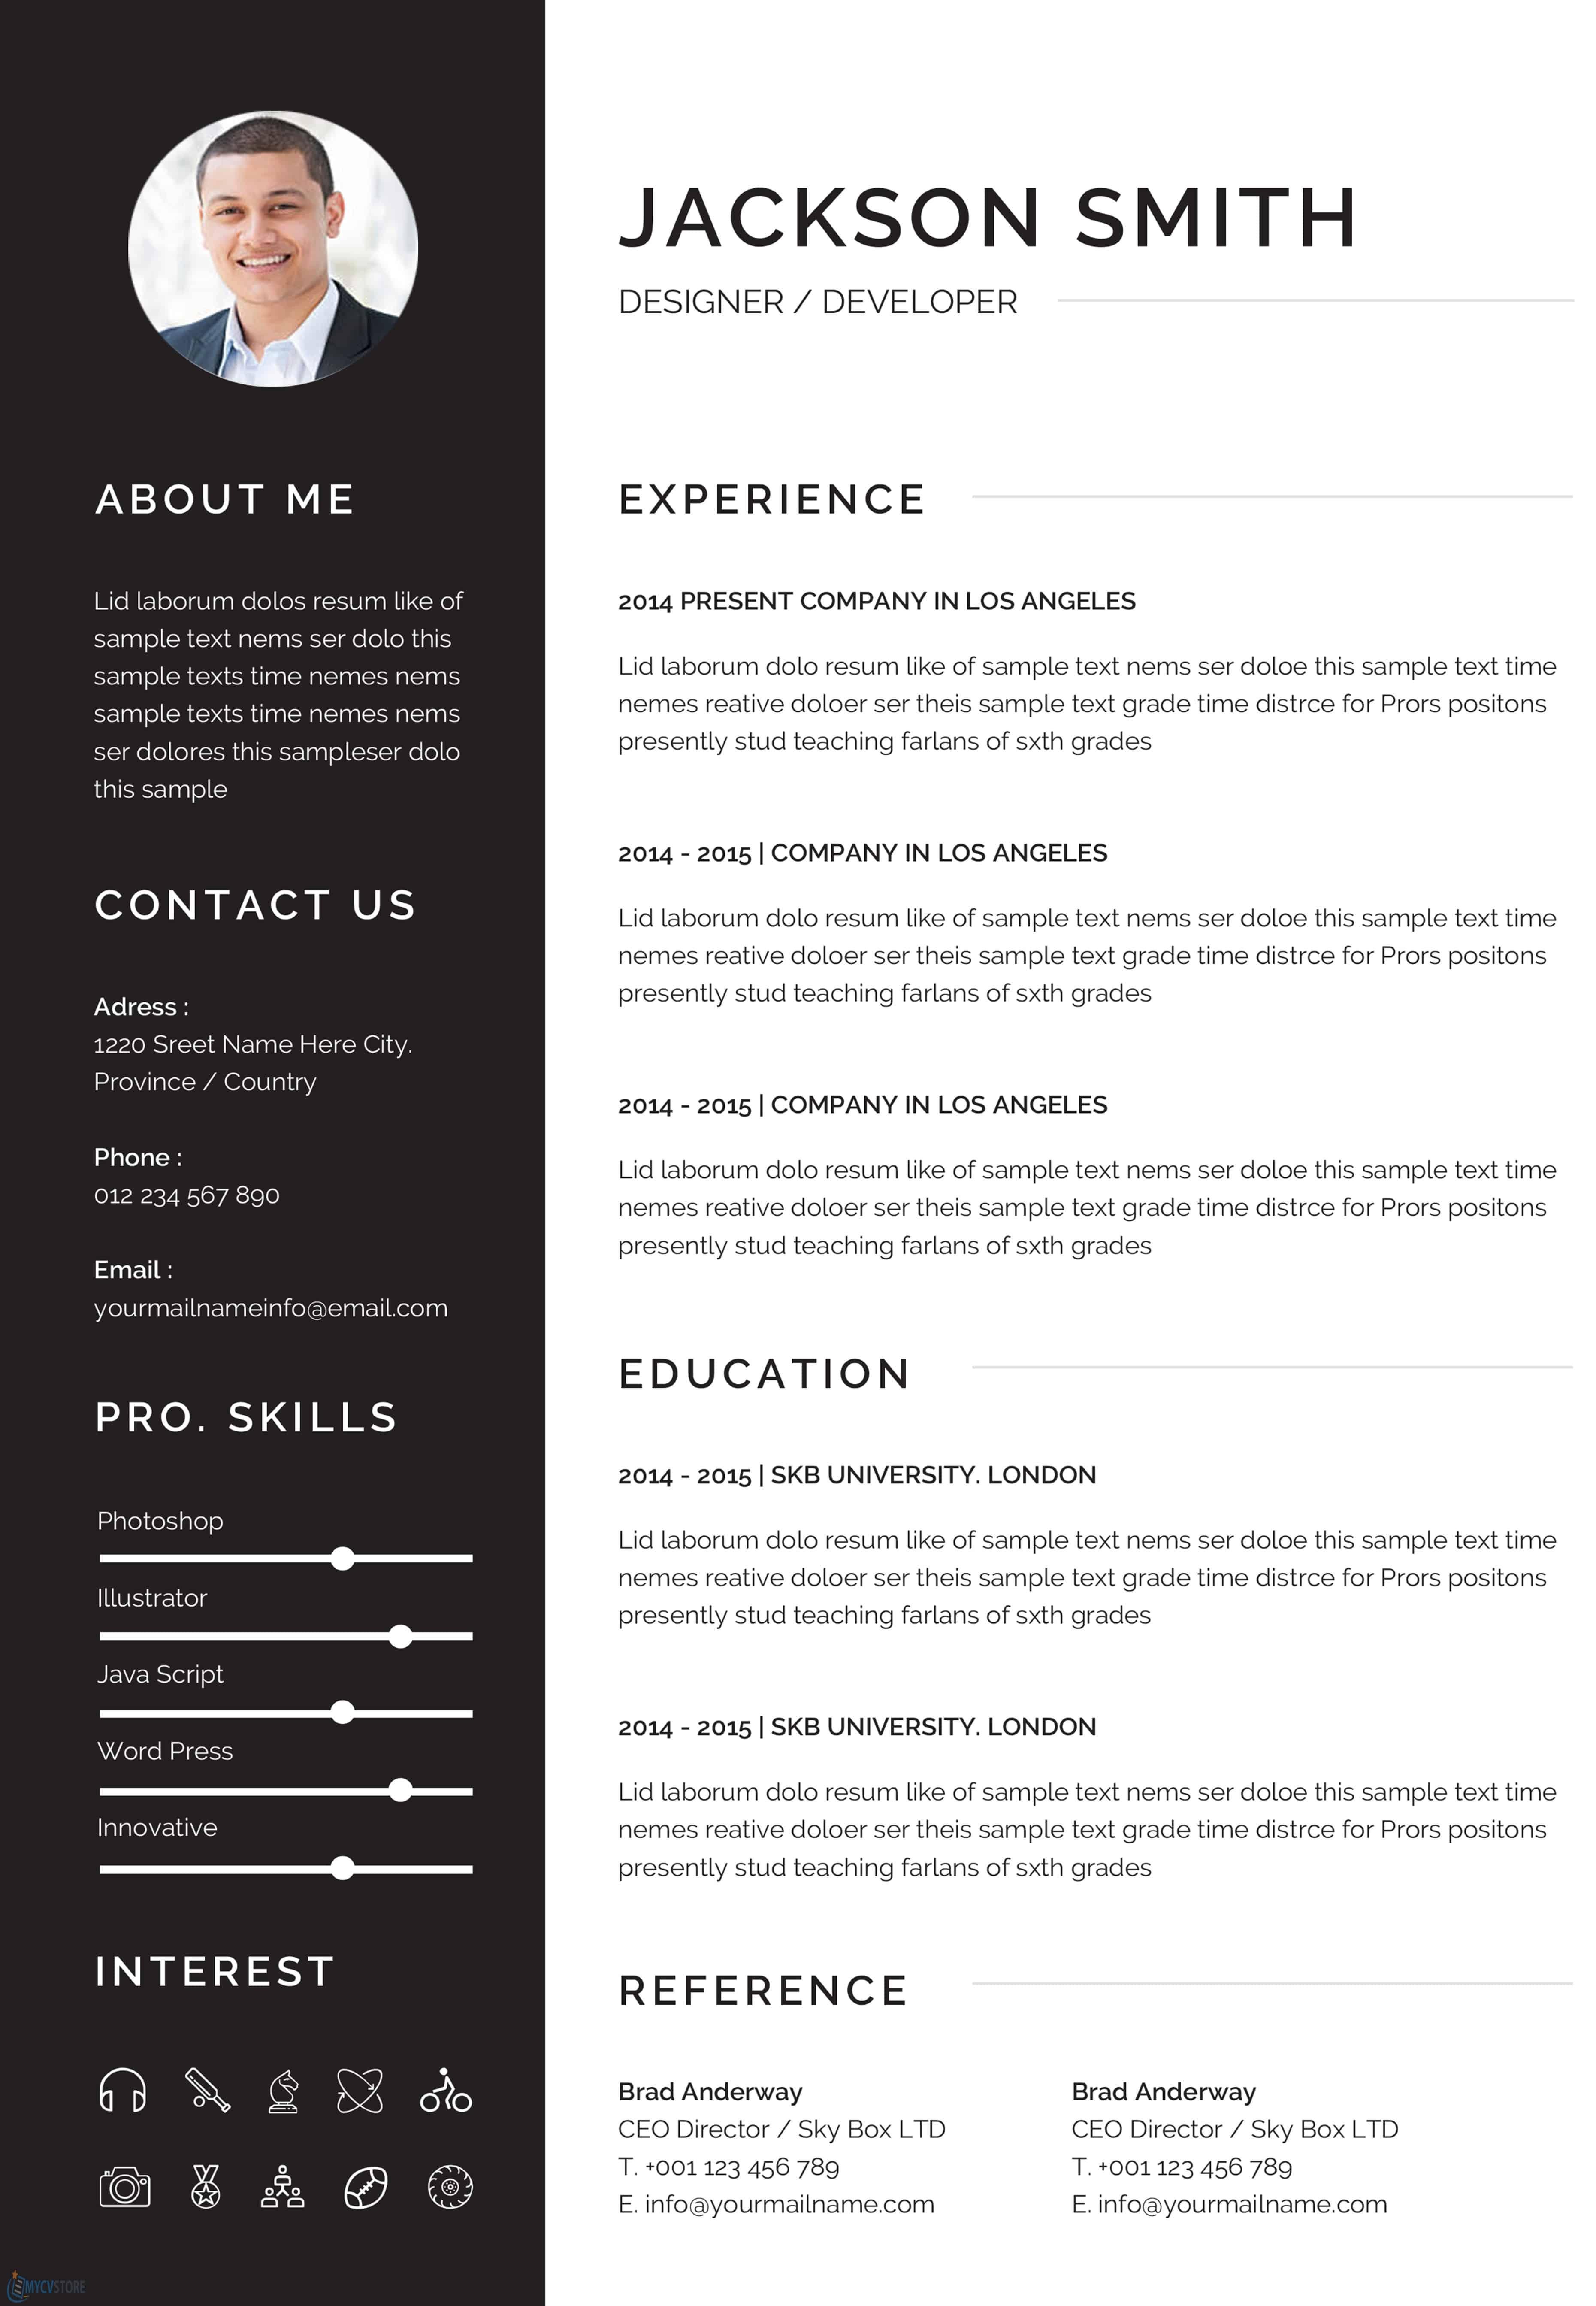 Resume Template - Editable Downloadable CV Word